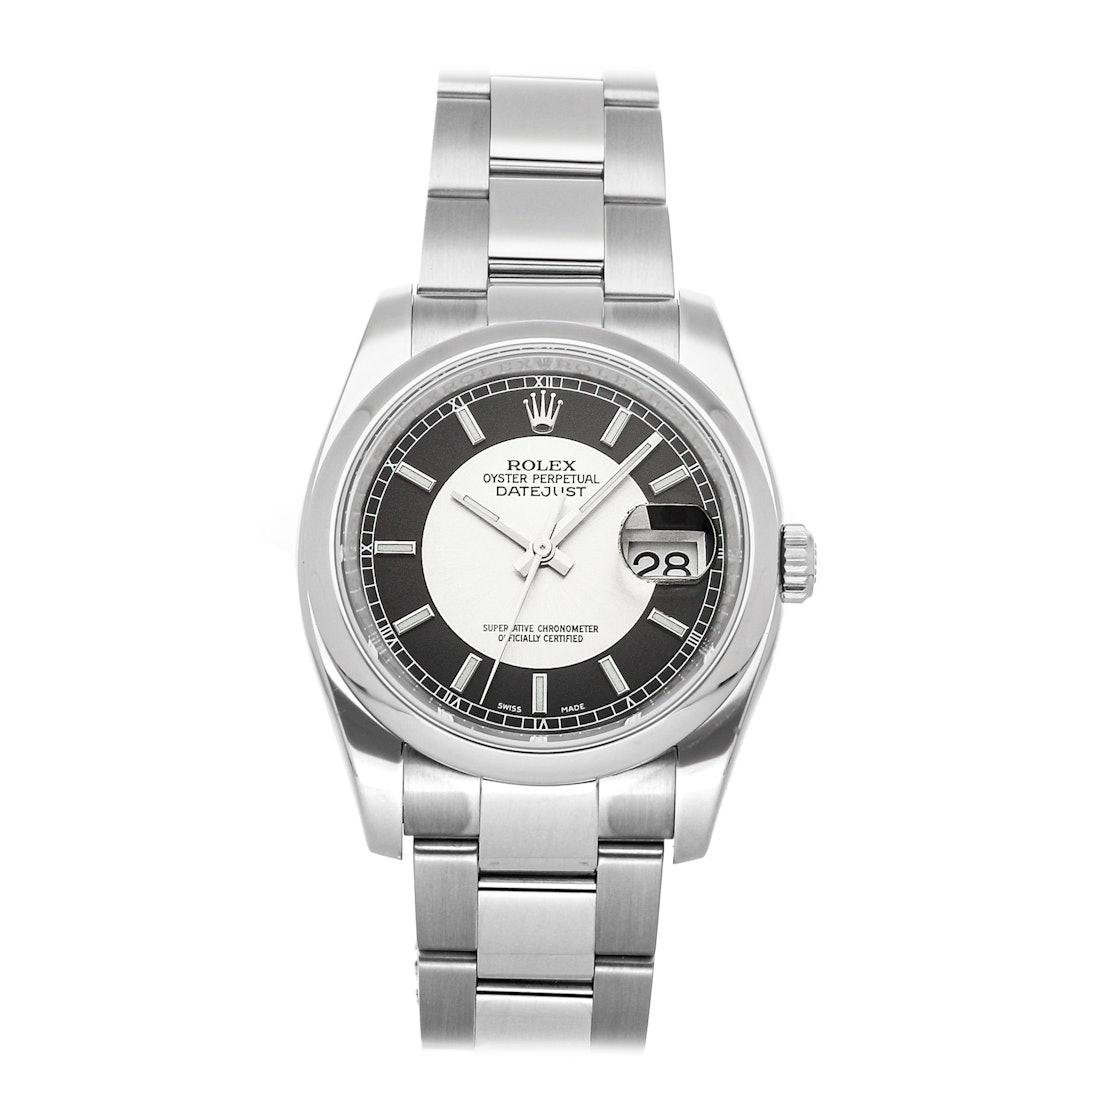 Rolex Datejust 116200